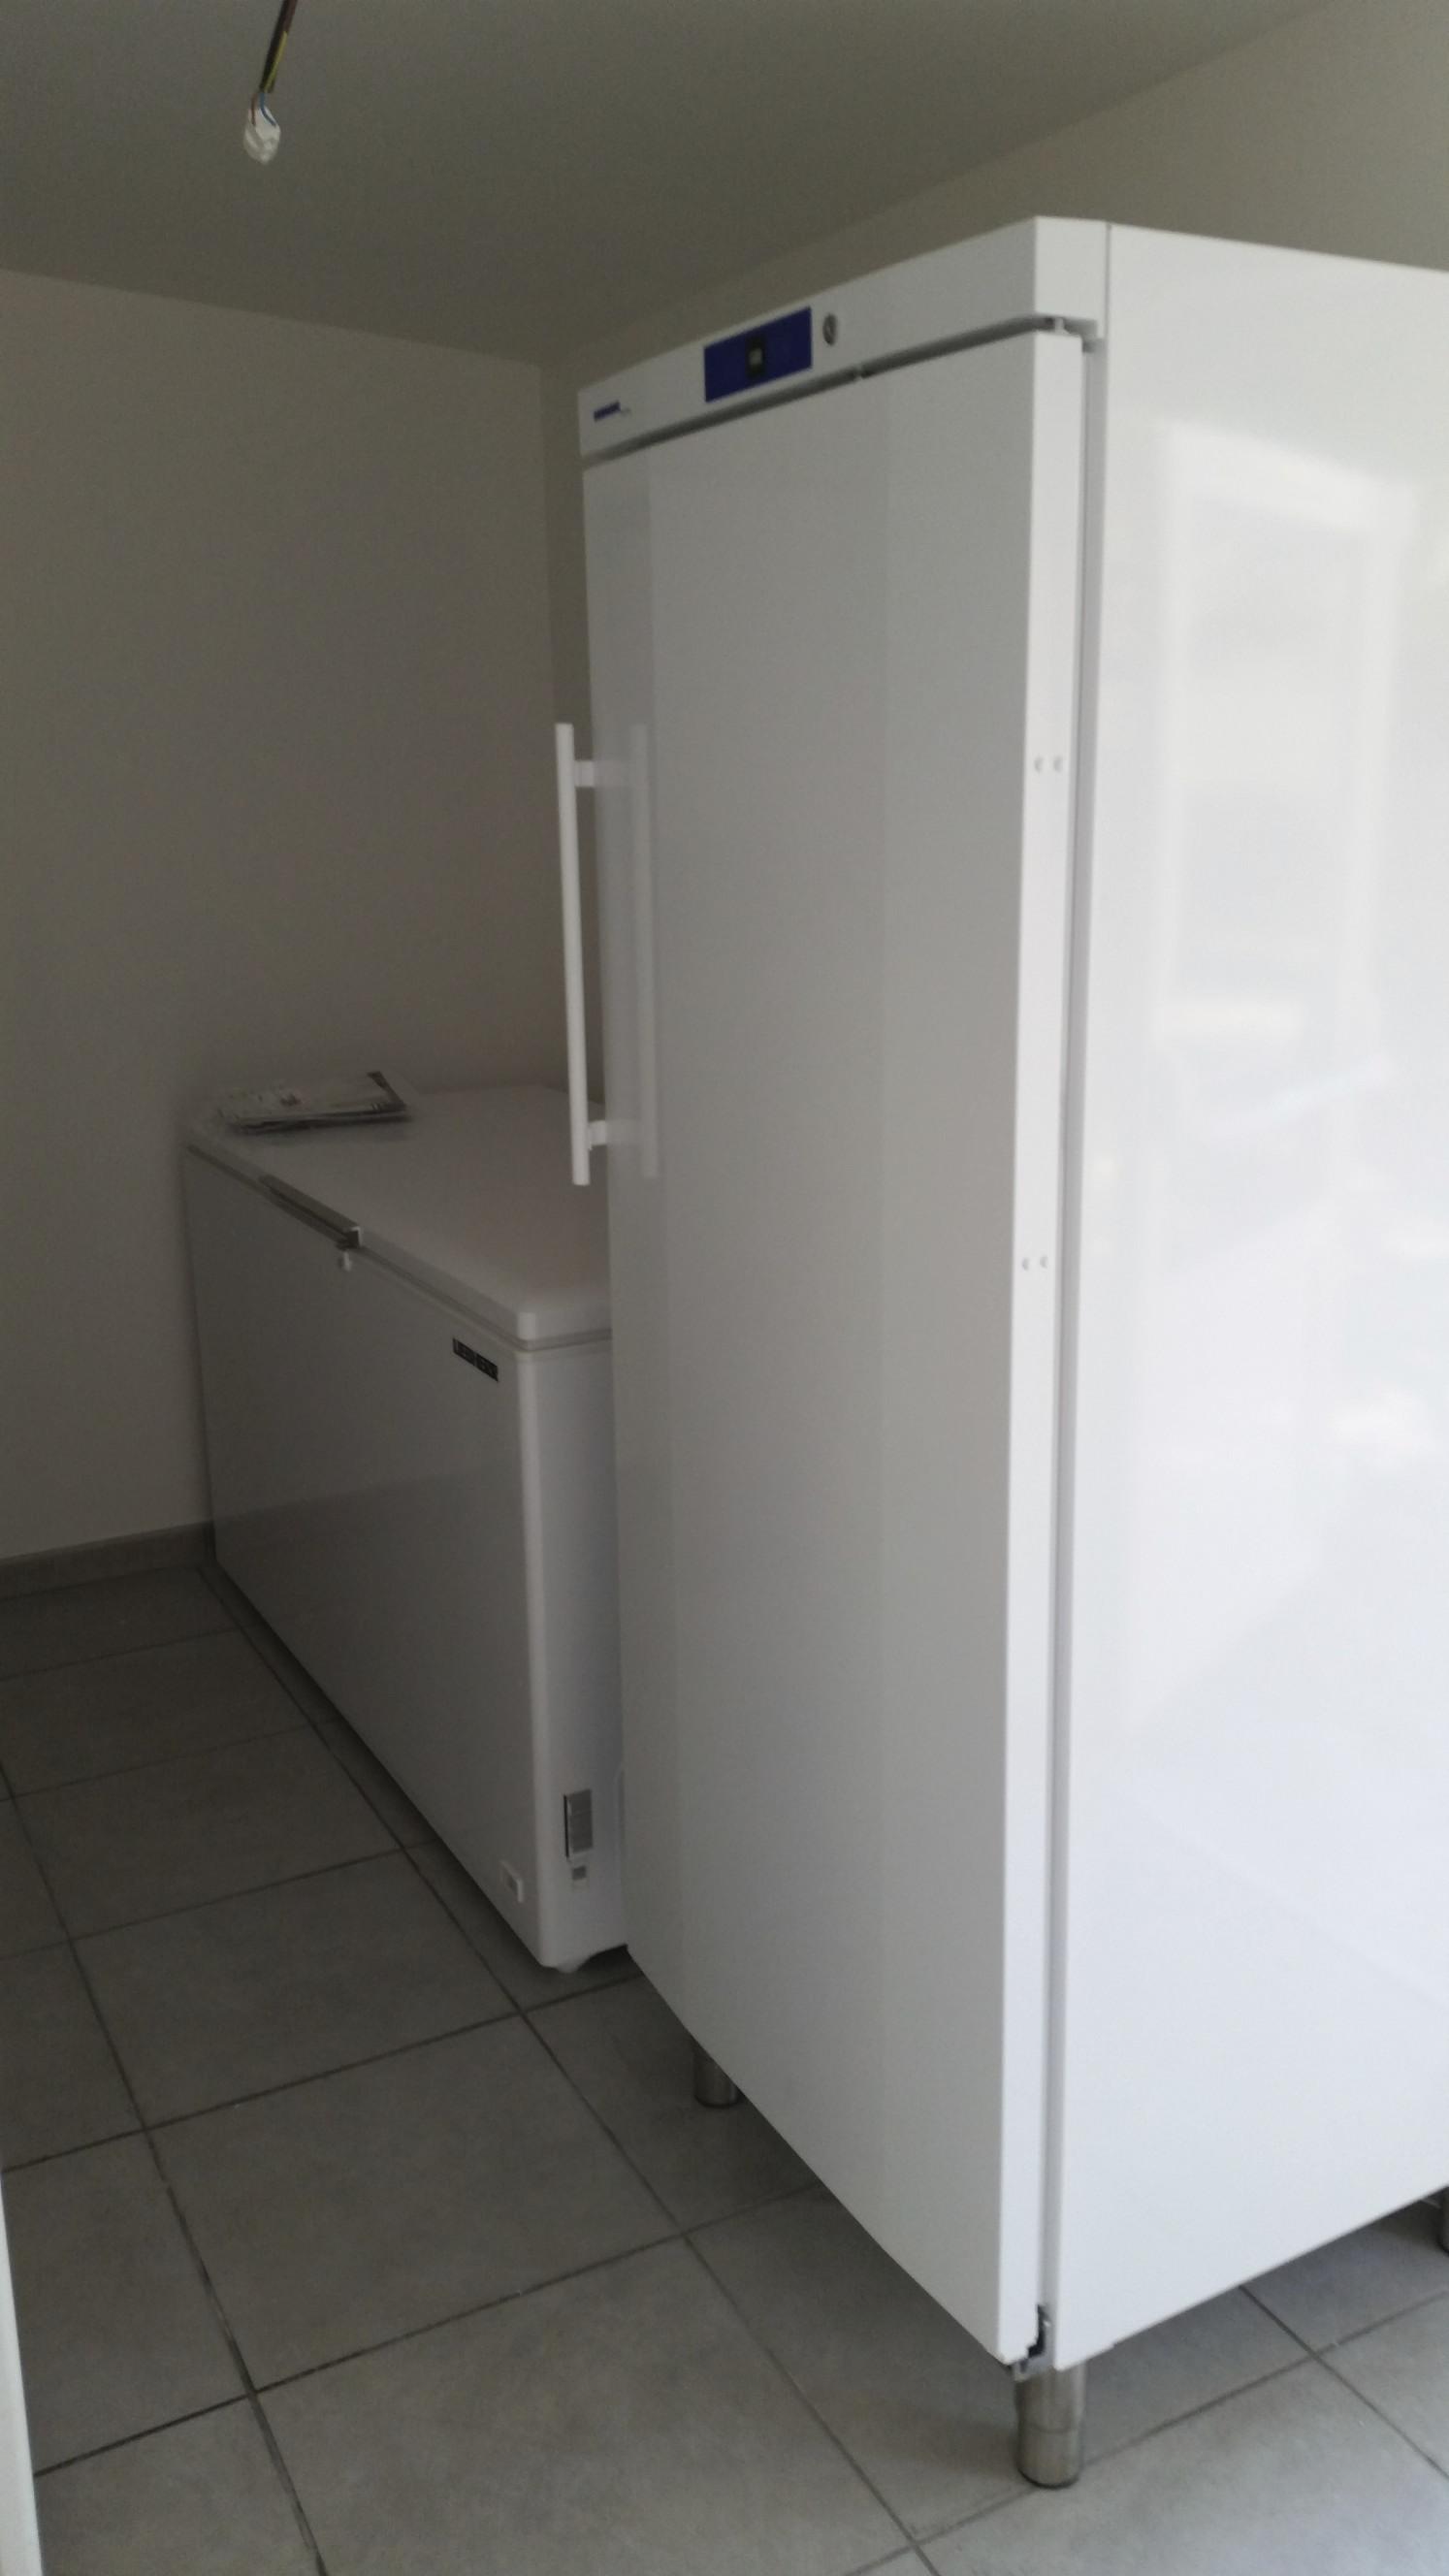 Darmac zone de froid en cuisine professionnelle for Armoire chauffante cuisine professionnelle